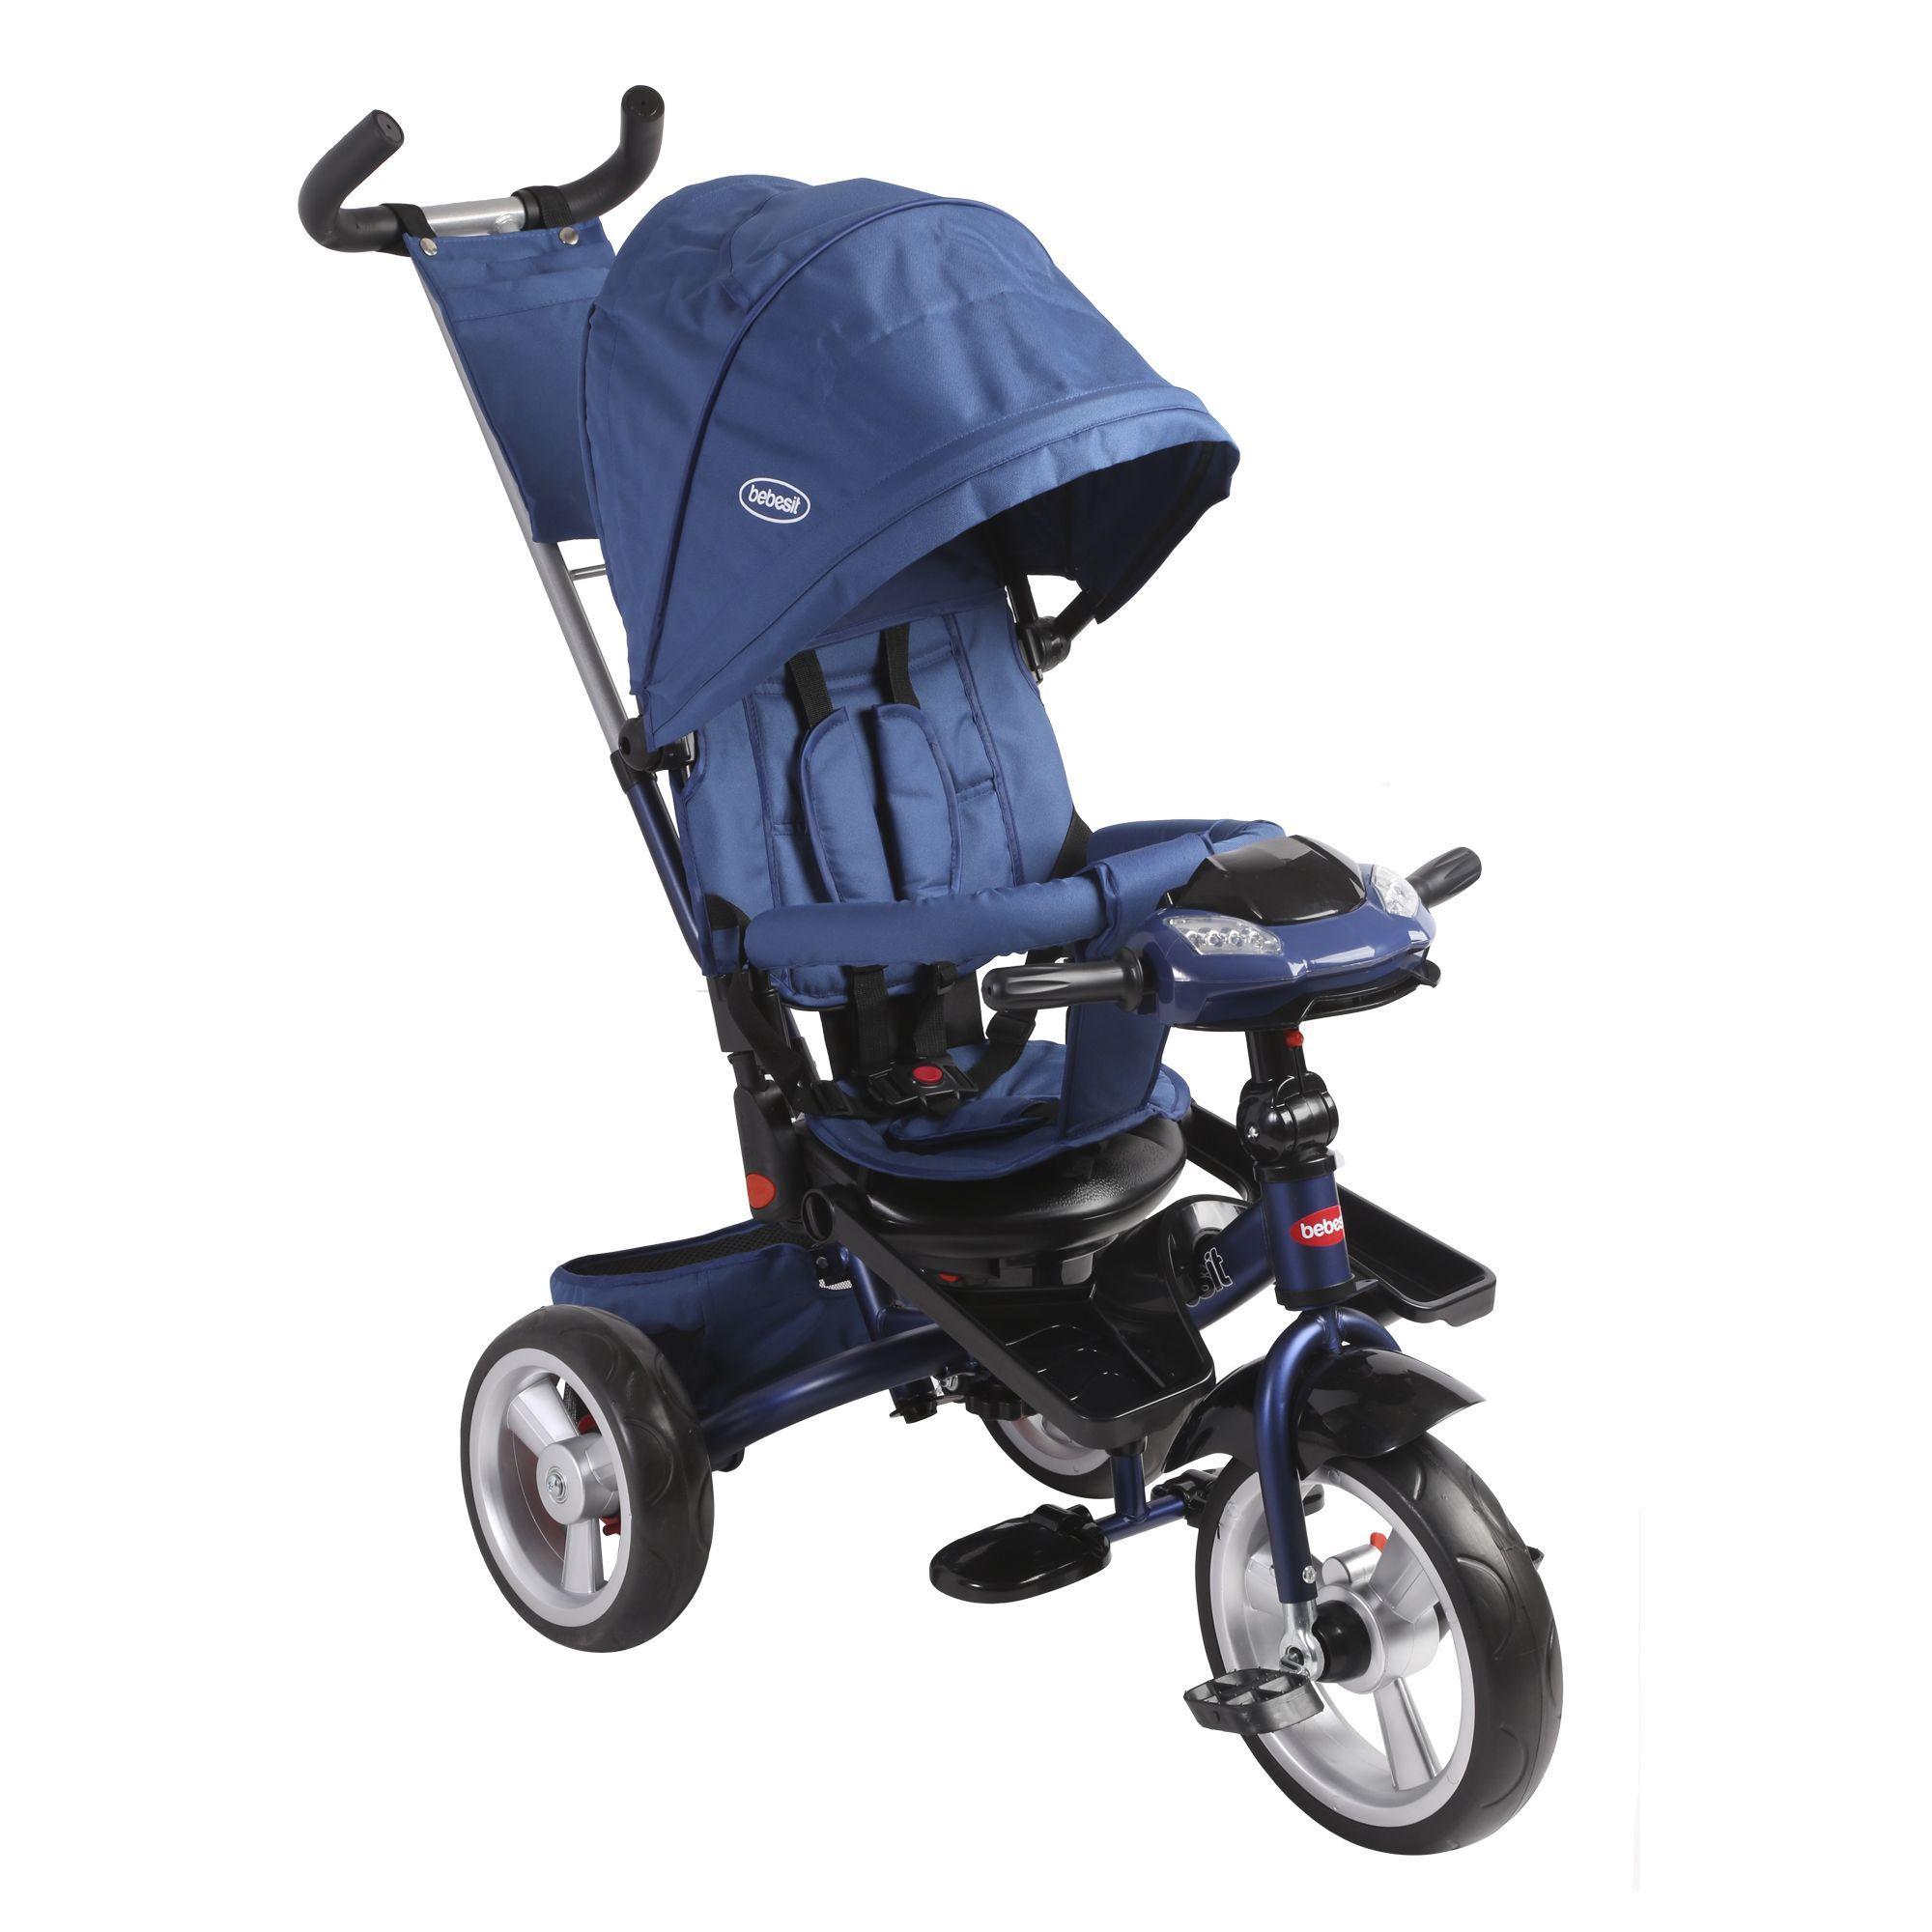 Triciclo Bebesit Trike 1315 - Azul